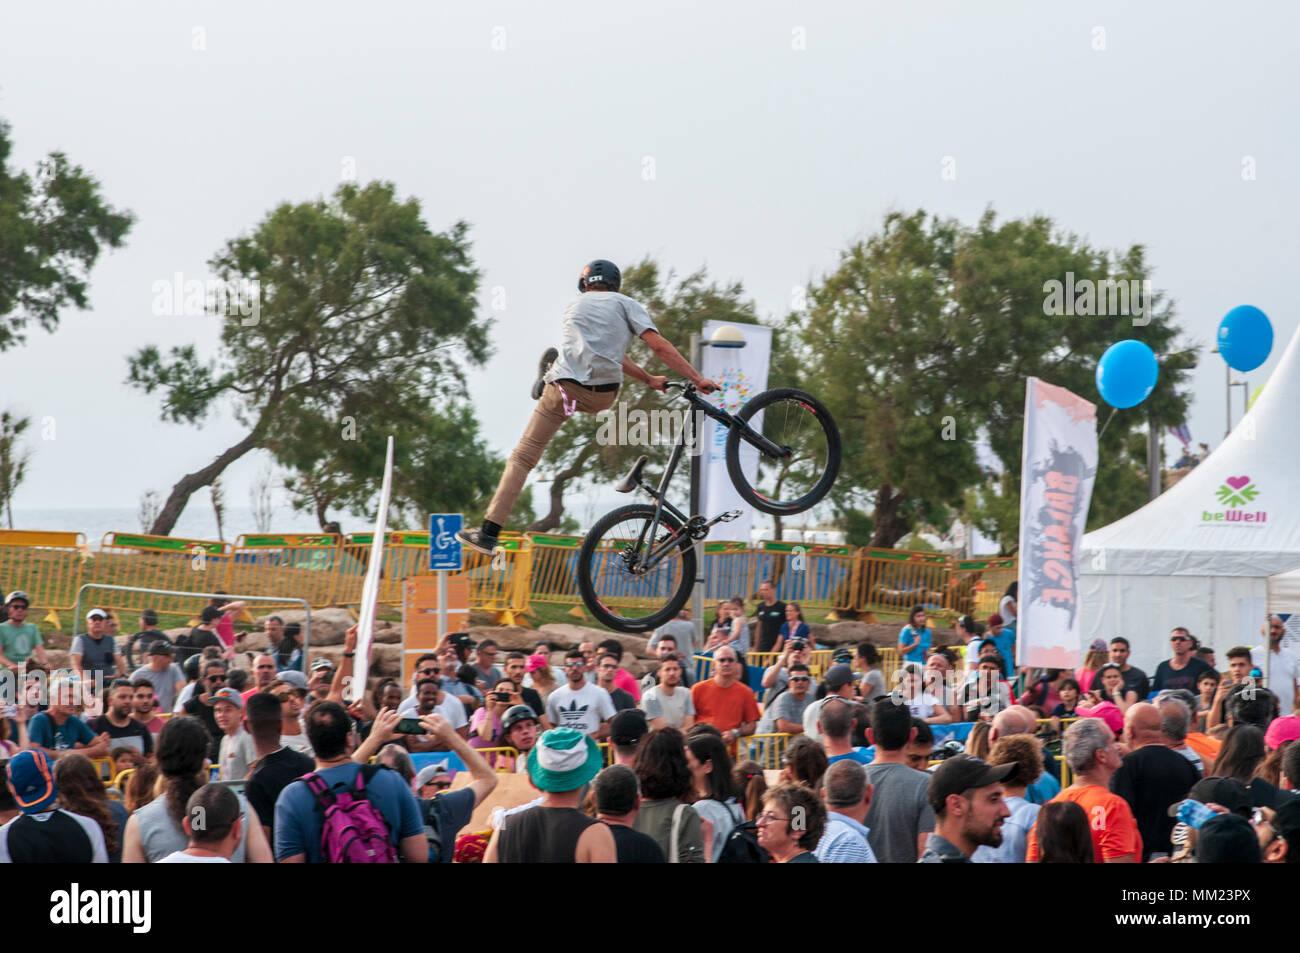 Bicycle stuntman a crowd of people watching below - Stock Image